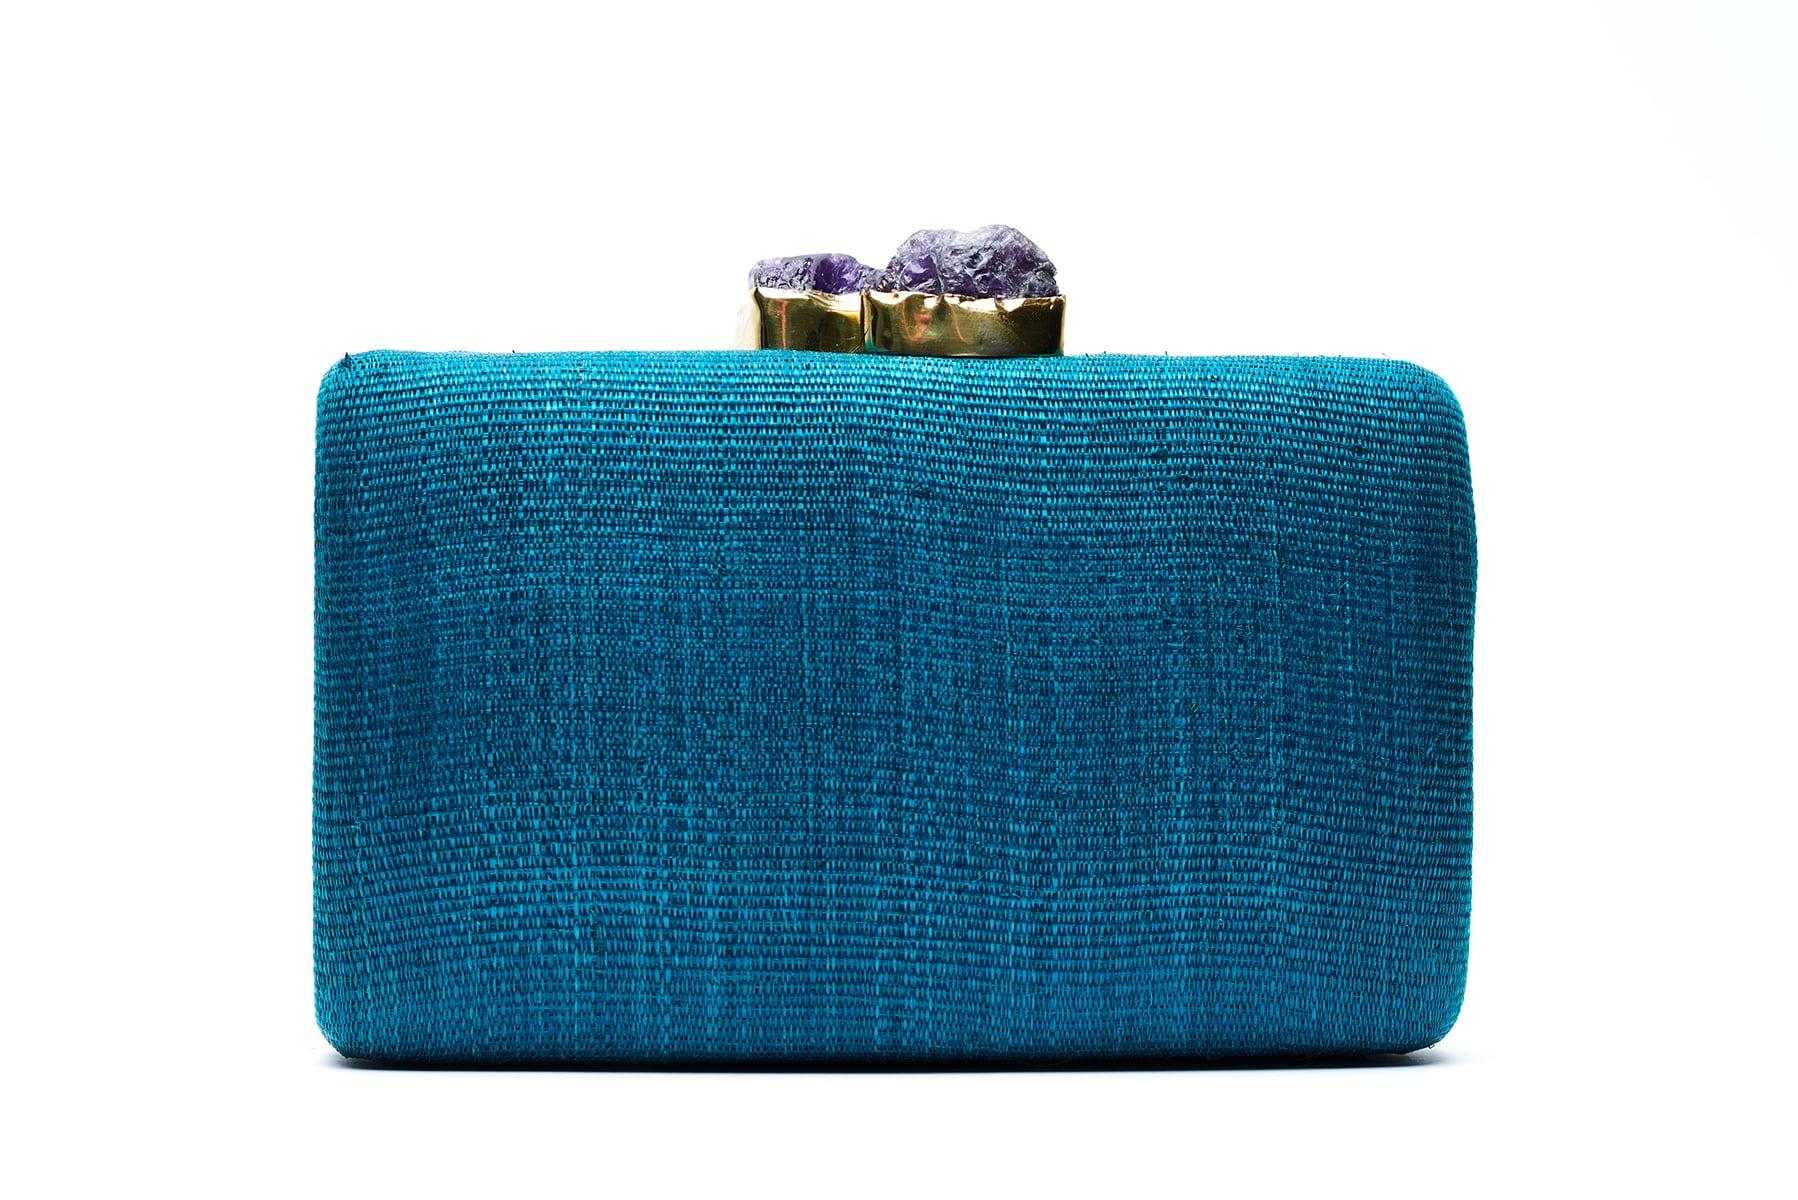 KAPRE TINA DARK GREEN W PURPLE QUARTZ - Bago Handicrafts